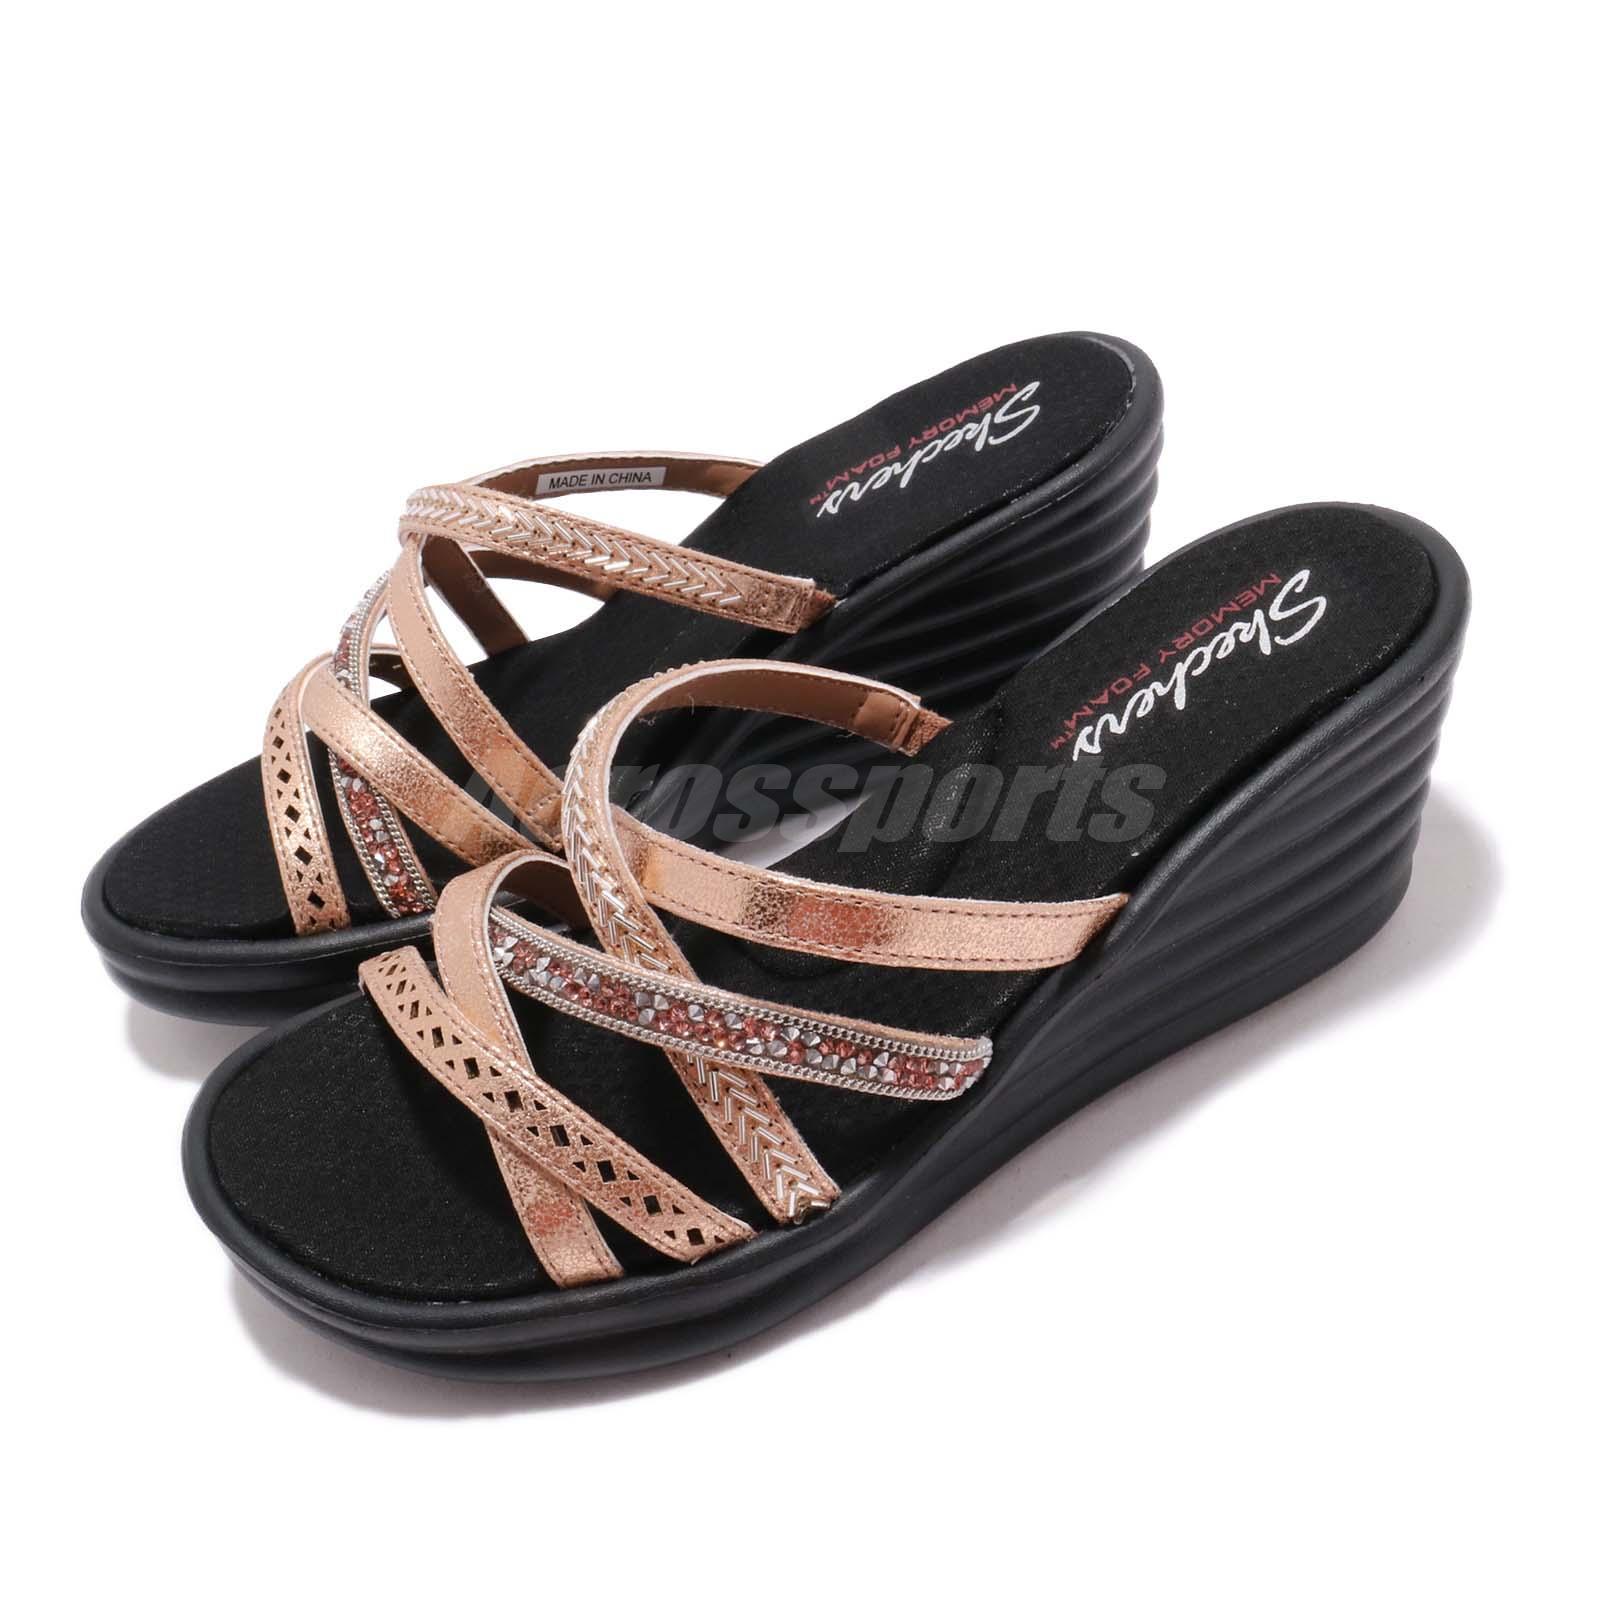 Women Wedge Sandals 31777-RSGD